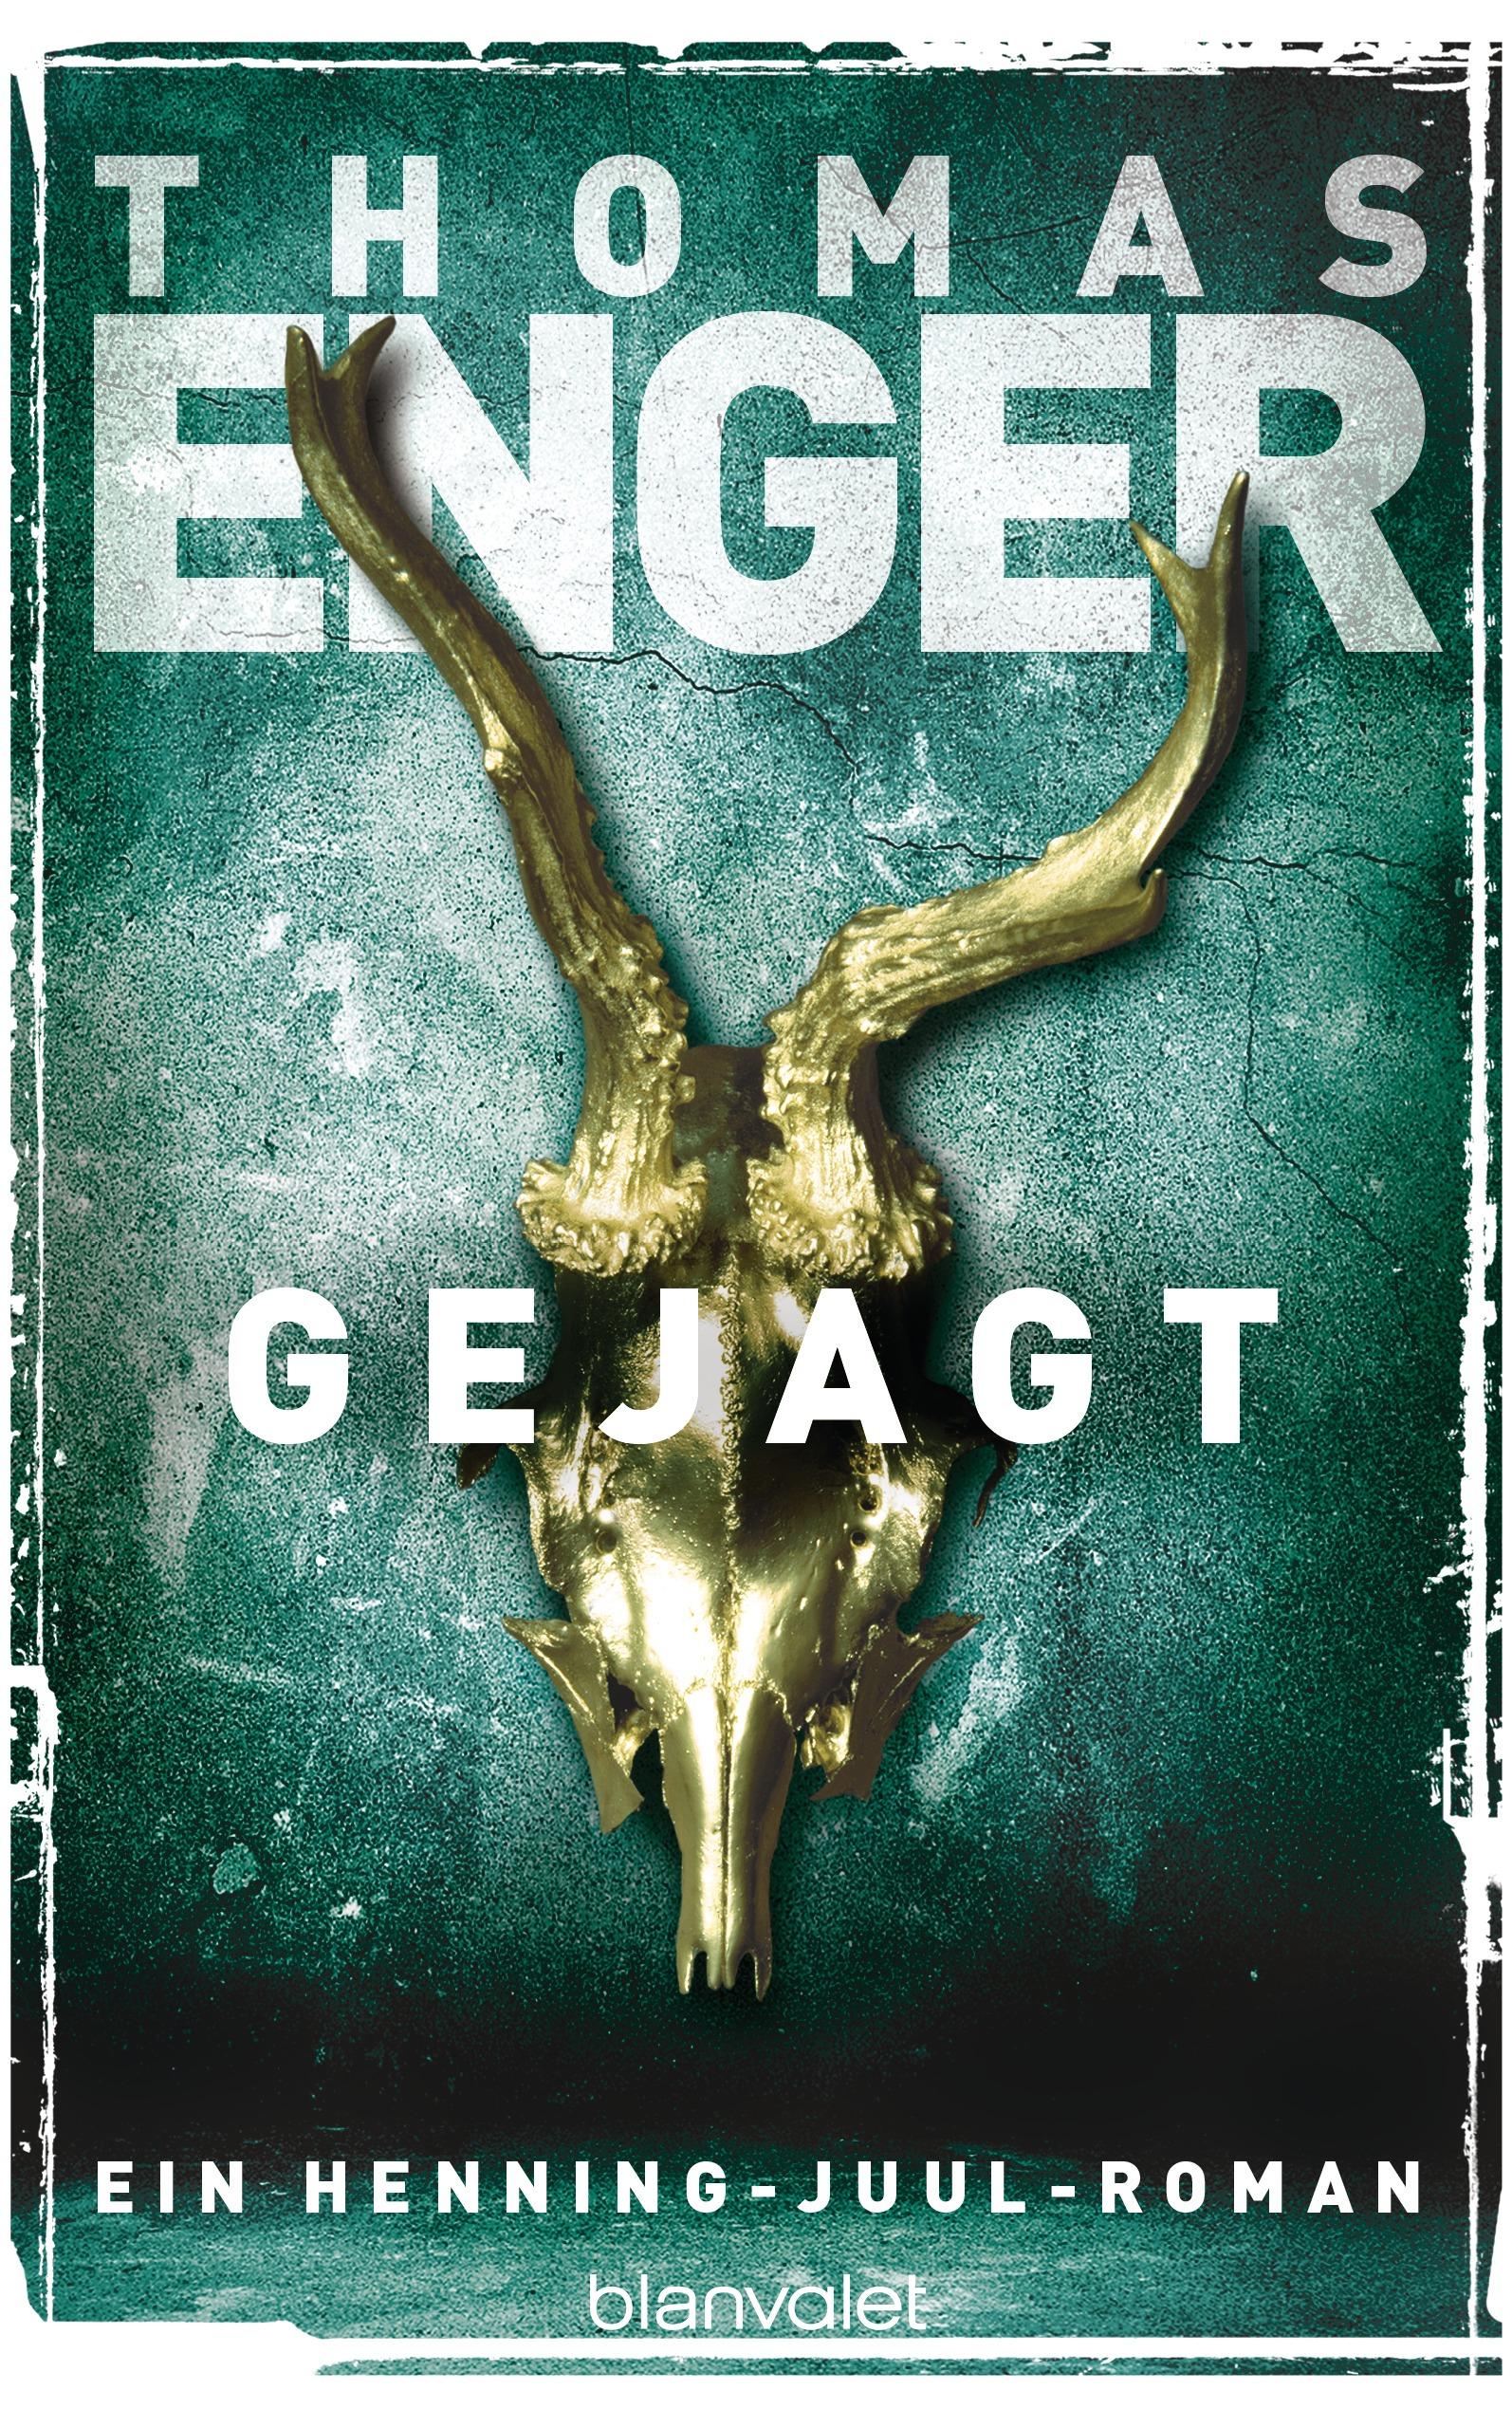 Gejagt: Henning-Juul 4 - Thomas Enger